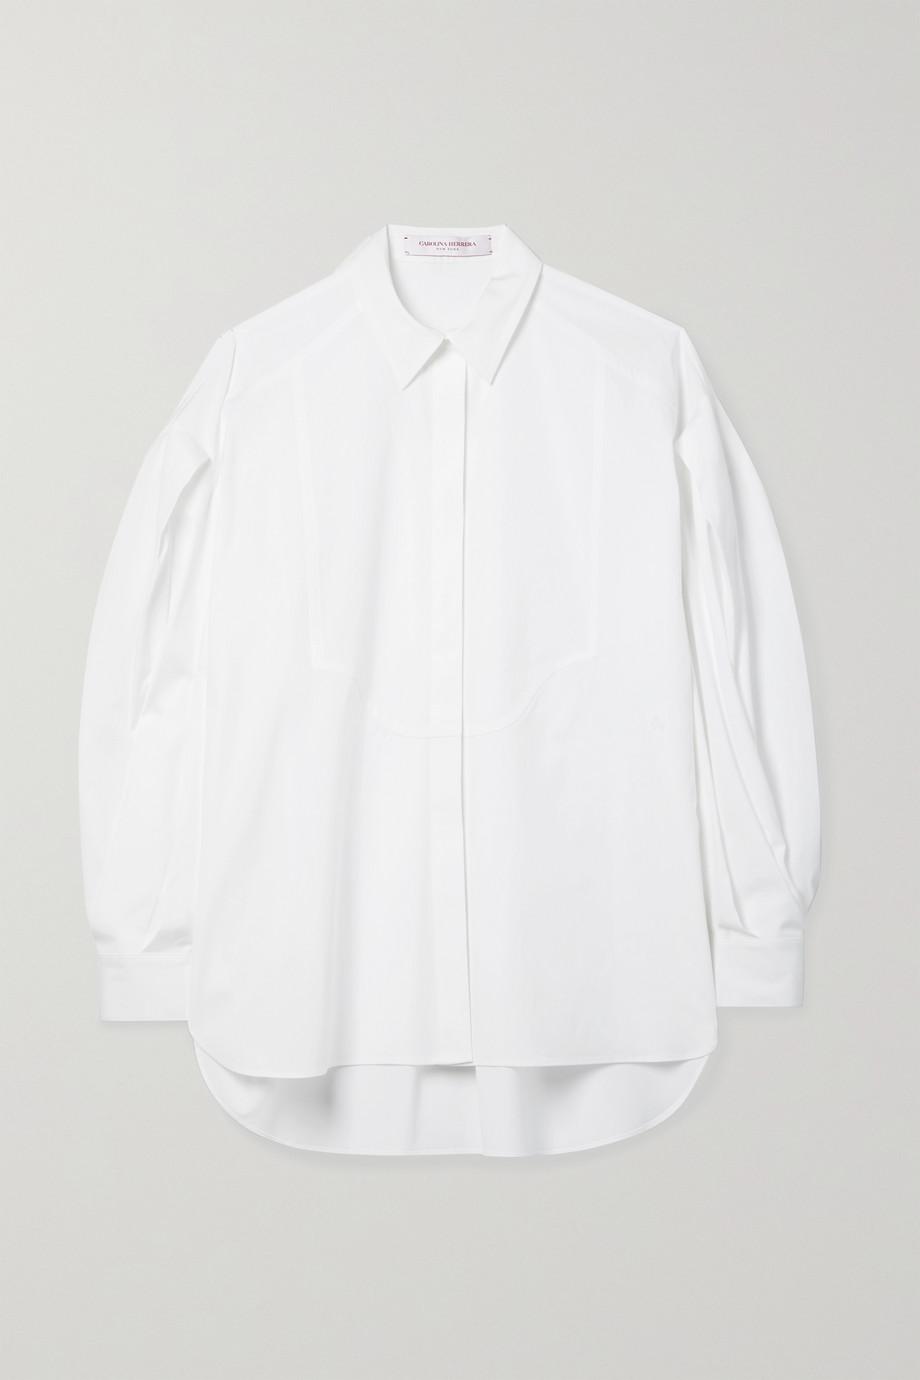 Carolina Herrera Chemise en popeline de coton mélangé à plis